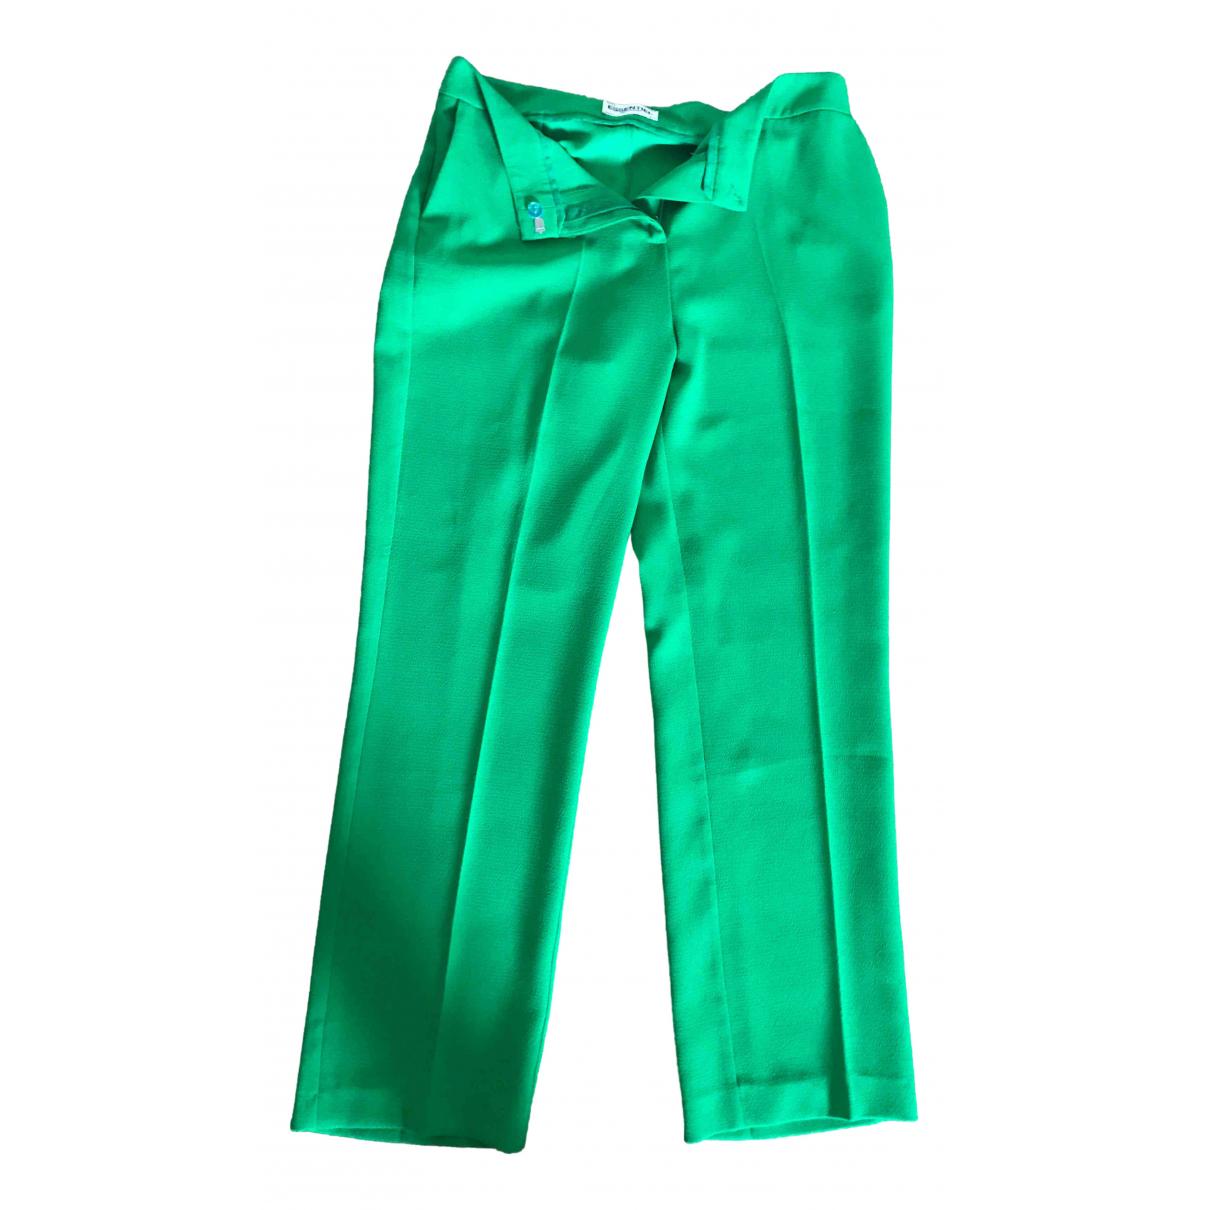 Pantalon recto Essentiel Antwerp